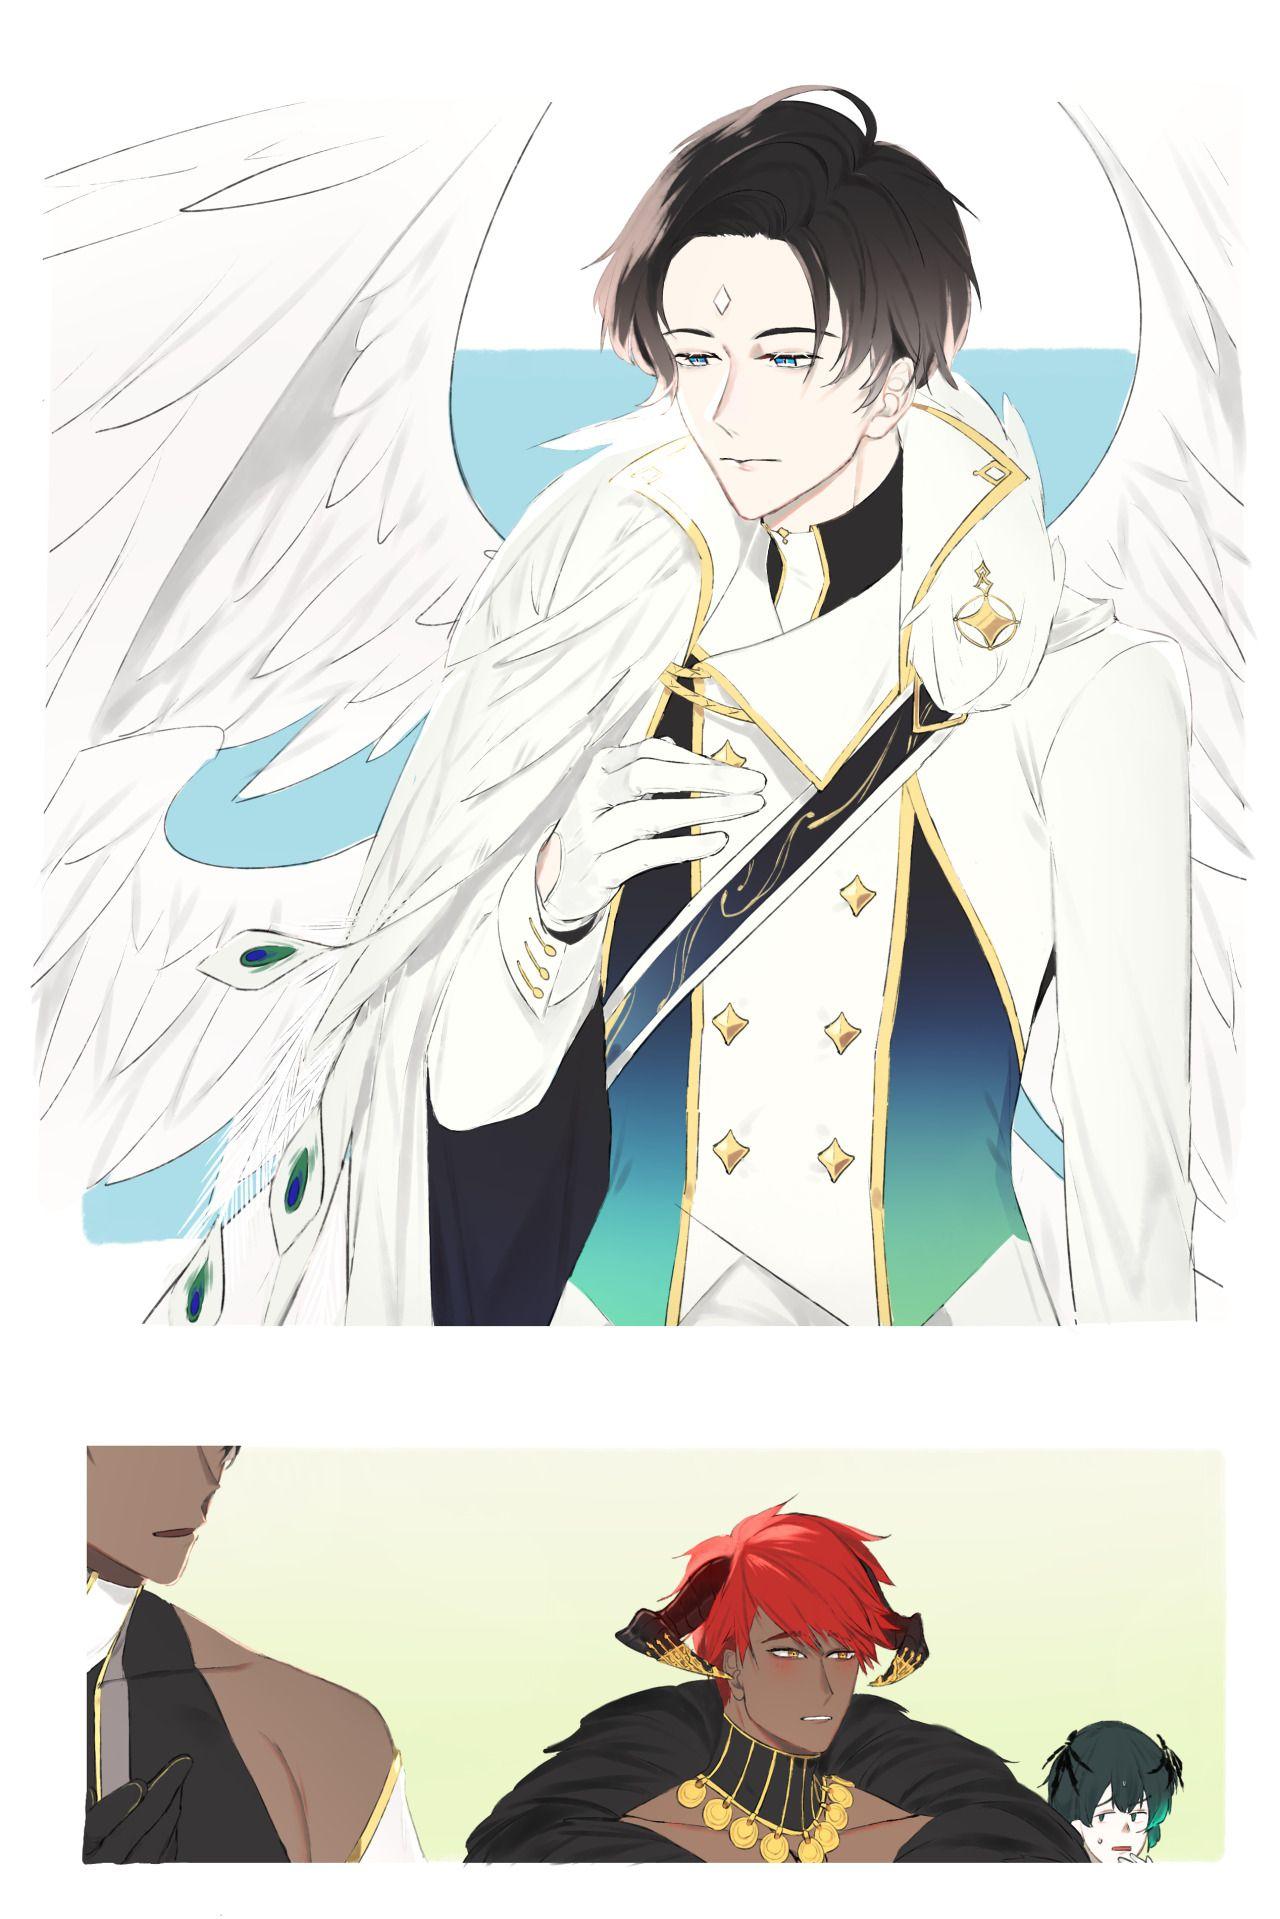 Saehyn Obey Art Anime Anime Characters